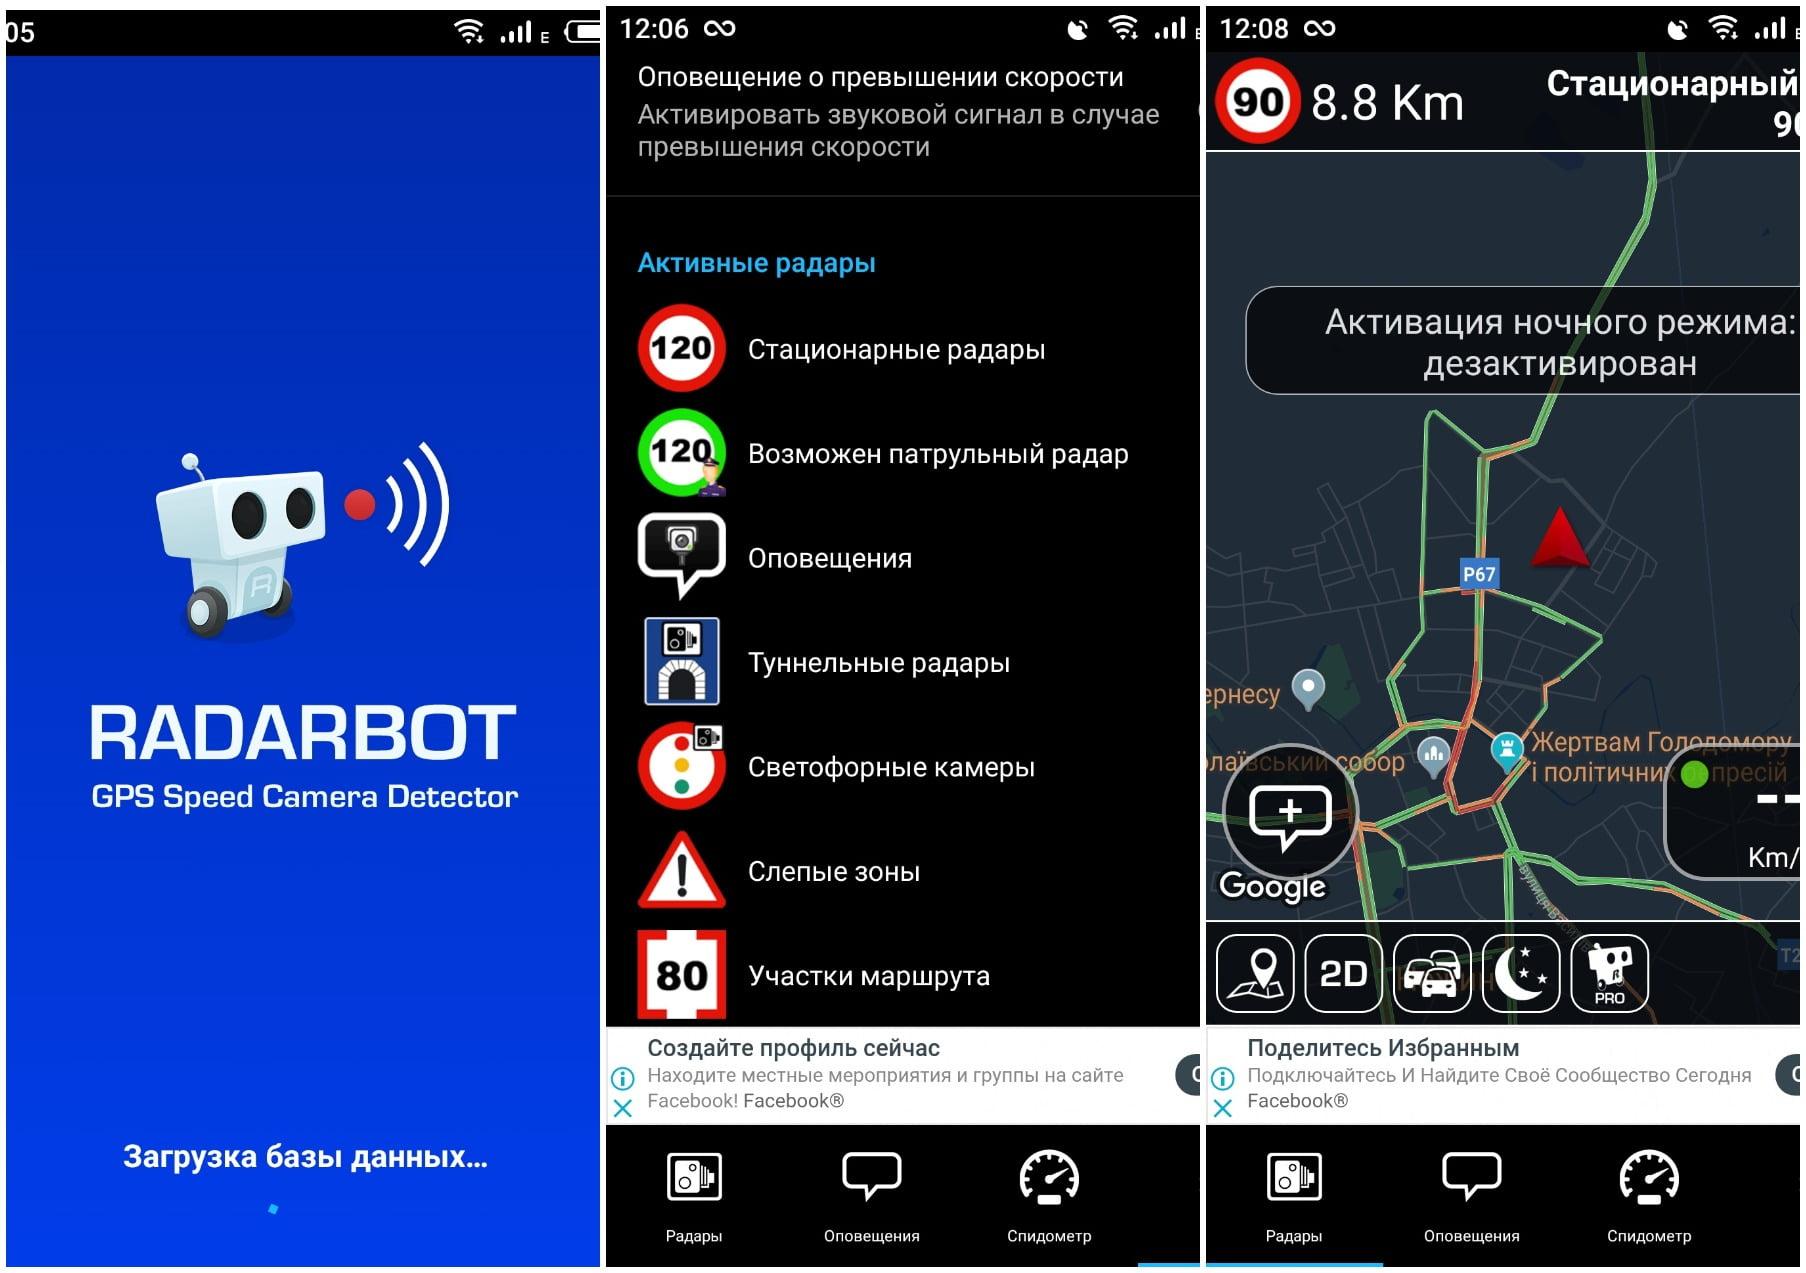 На фото изображено приложение Radarbot